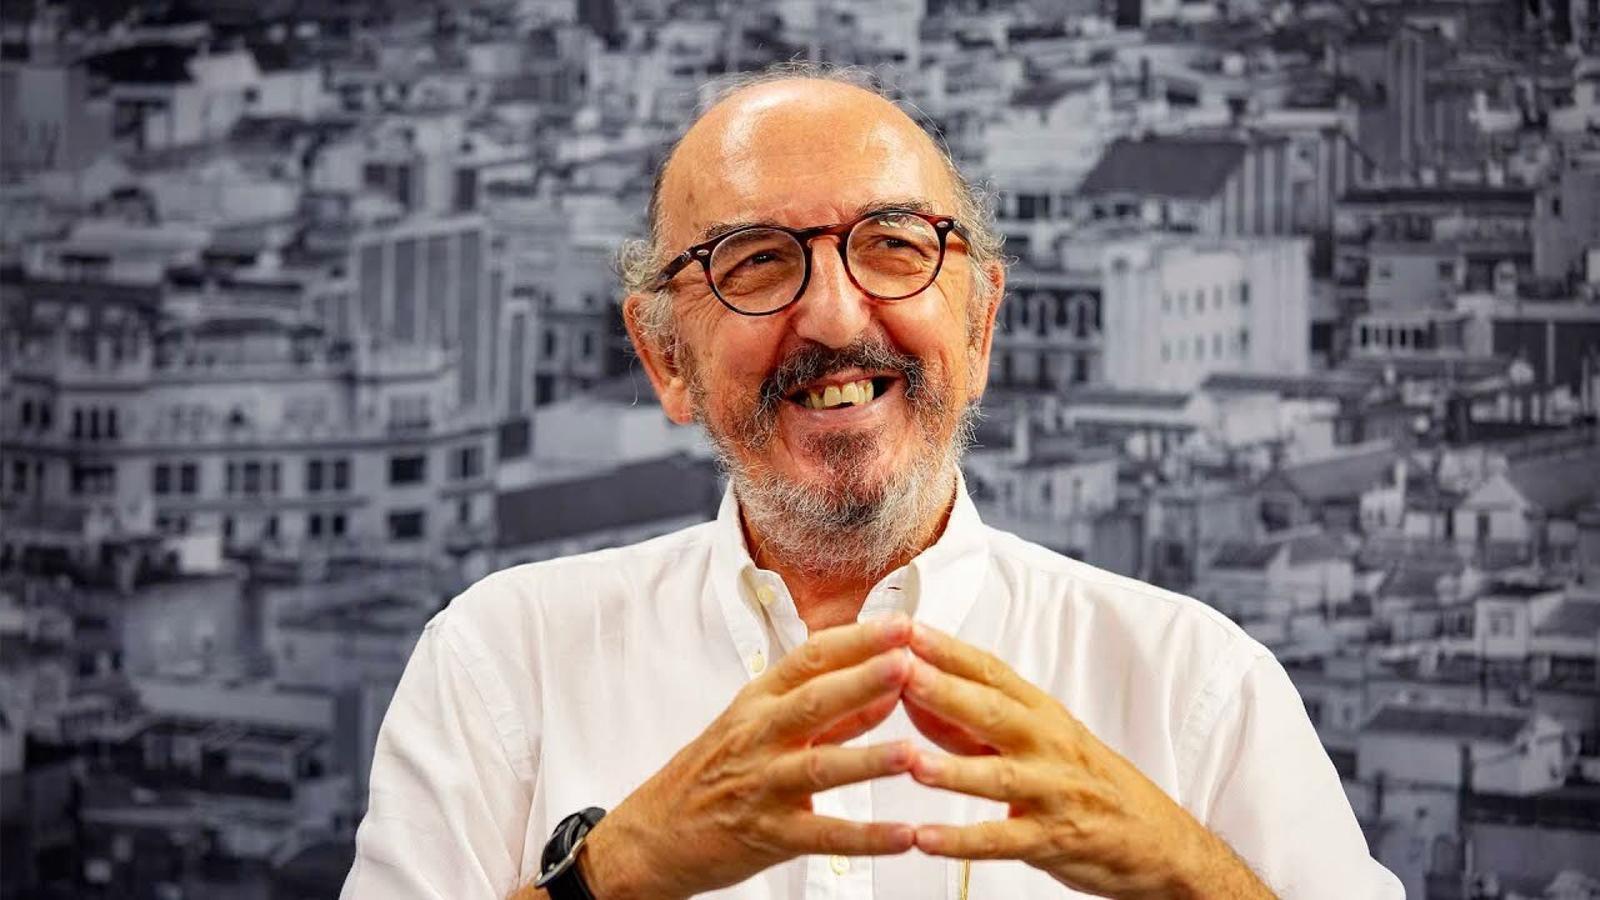 Entrevista d'Esther Vera i Albert Martín a Jaume Roures